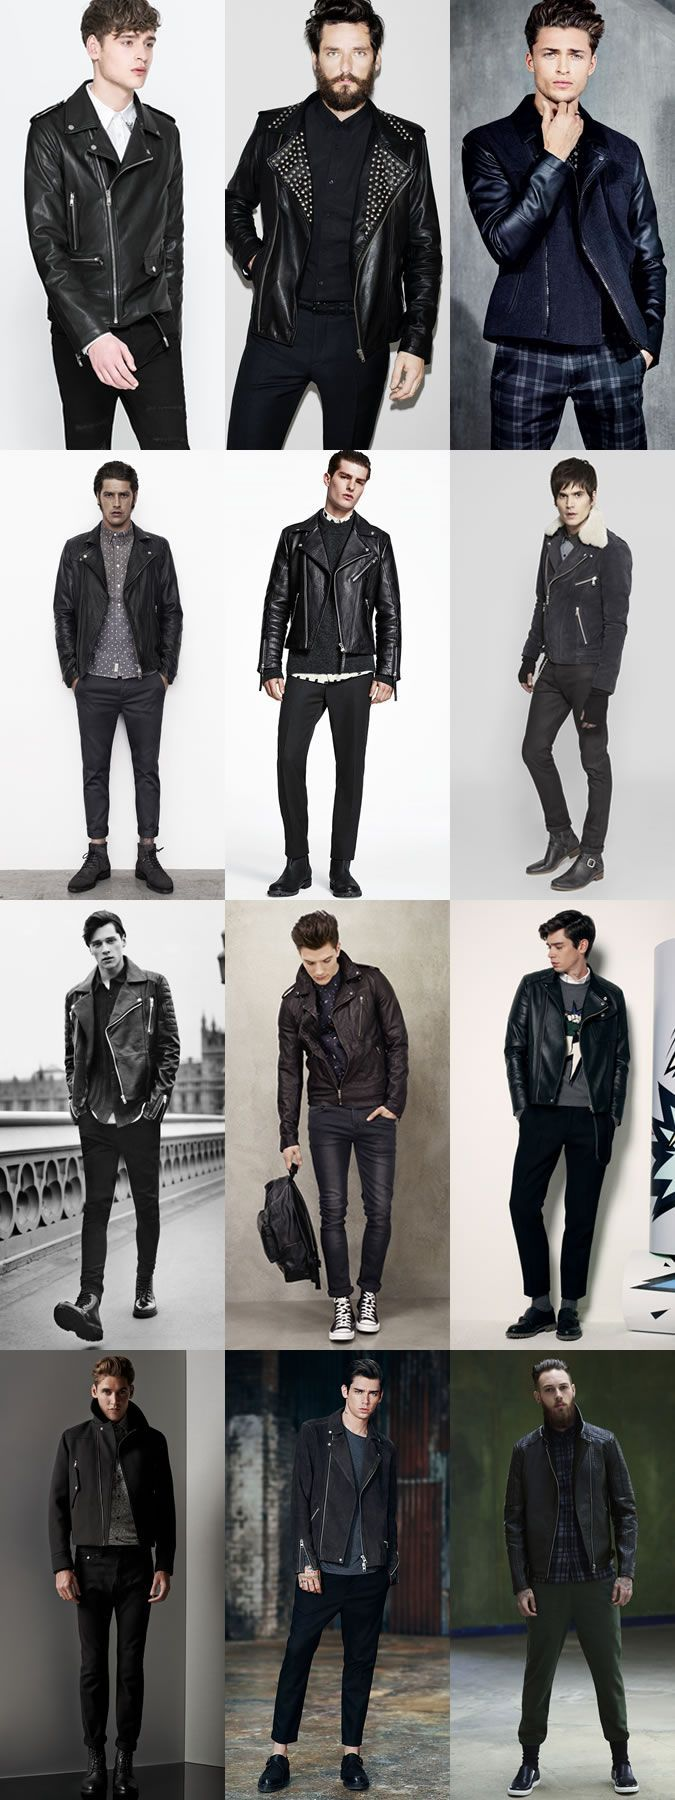 The Biker Jacket Style Inspiration | TheIdleMan.com #StyleMadeEasy